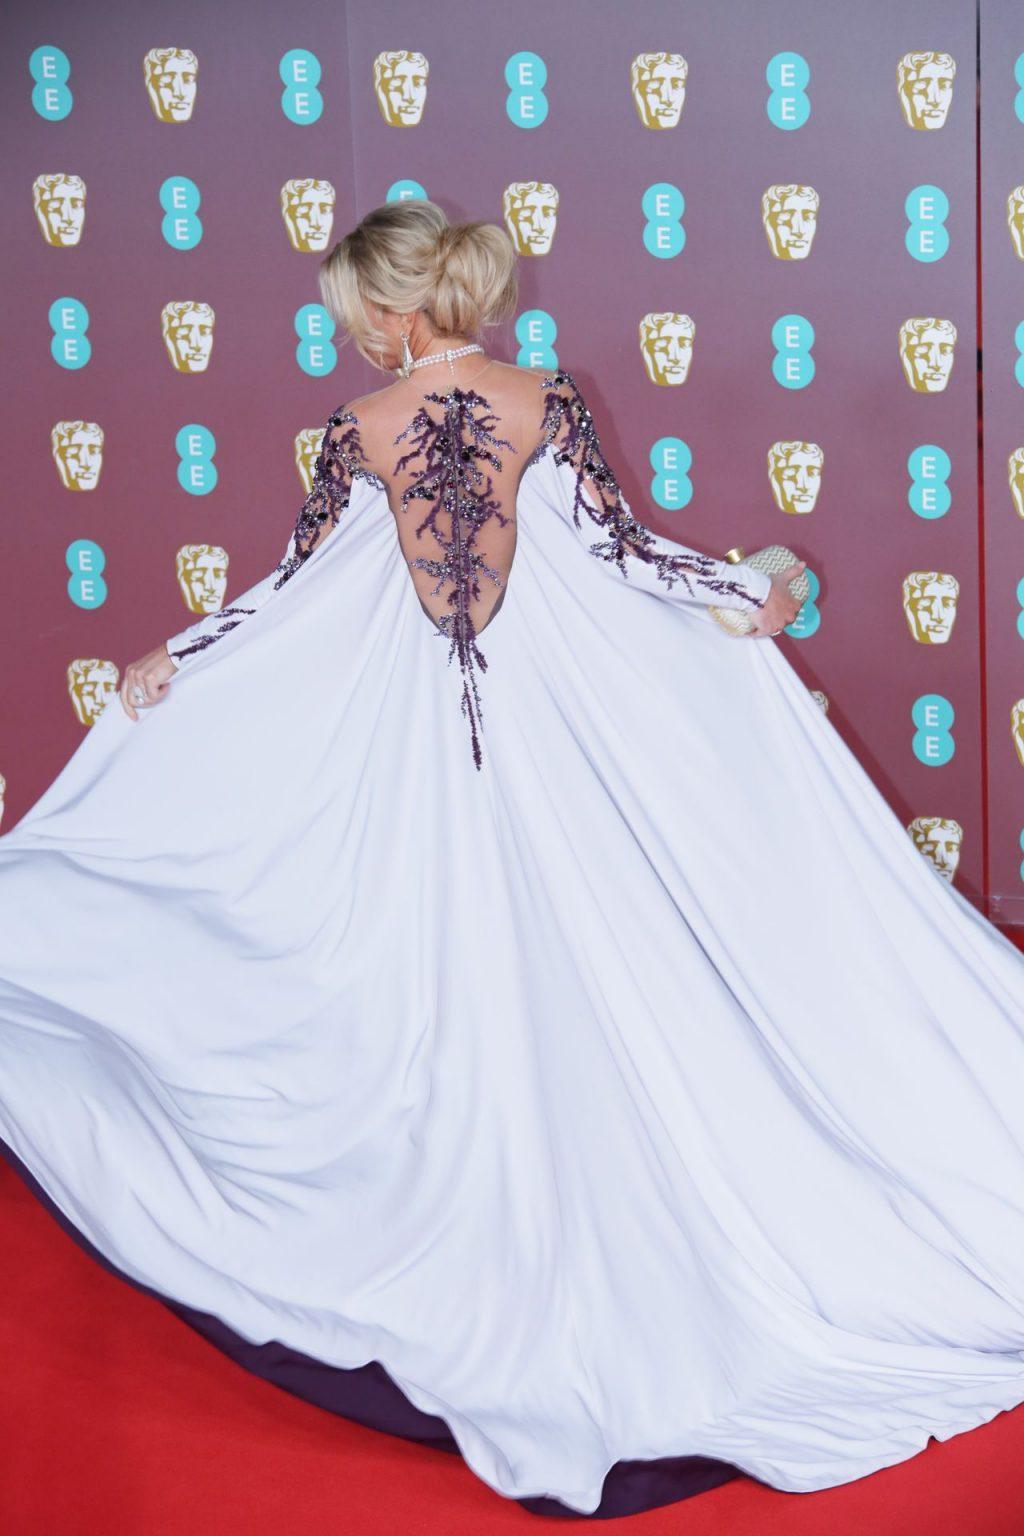 Hofit Golan Attends the BAFTA's at The Royal Albert Hall (29 Photos)